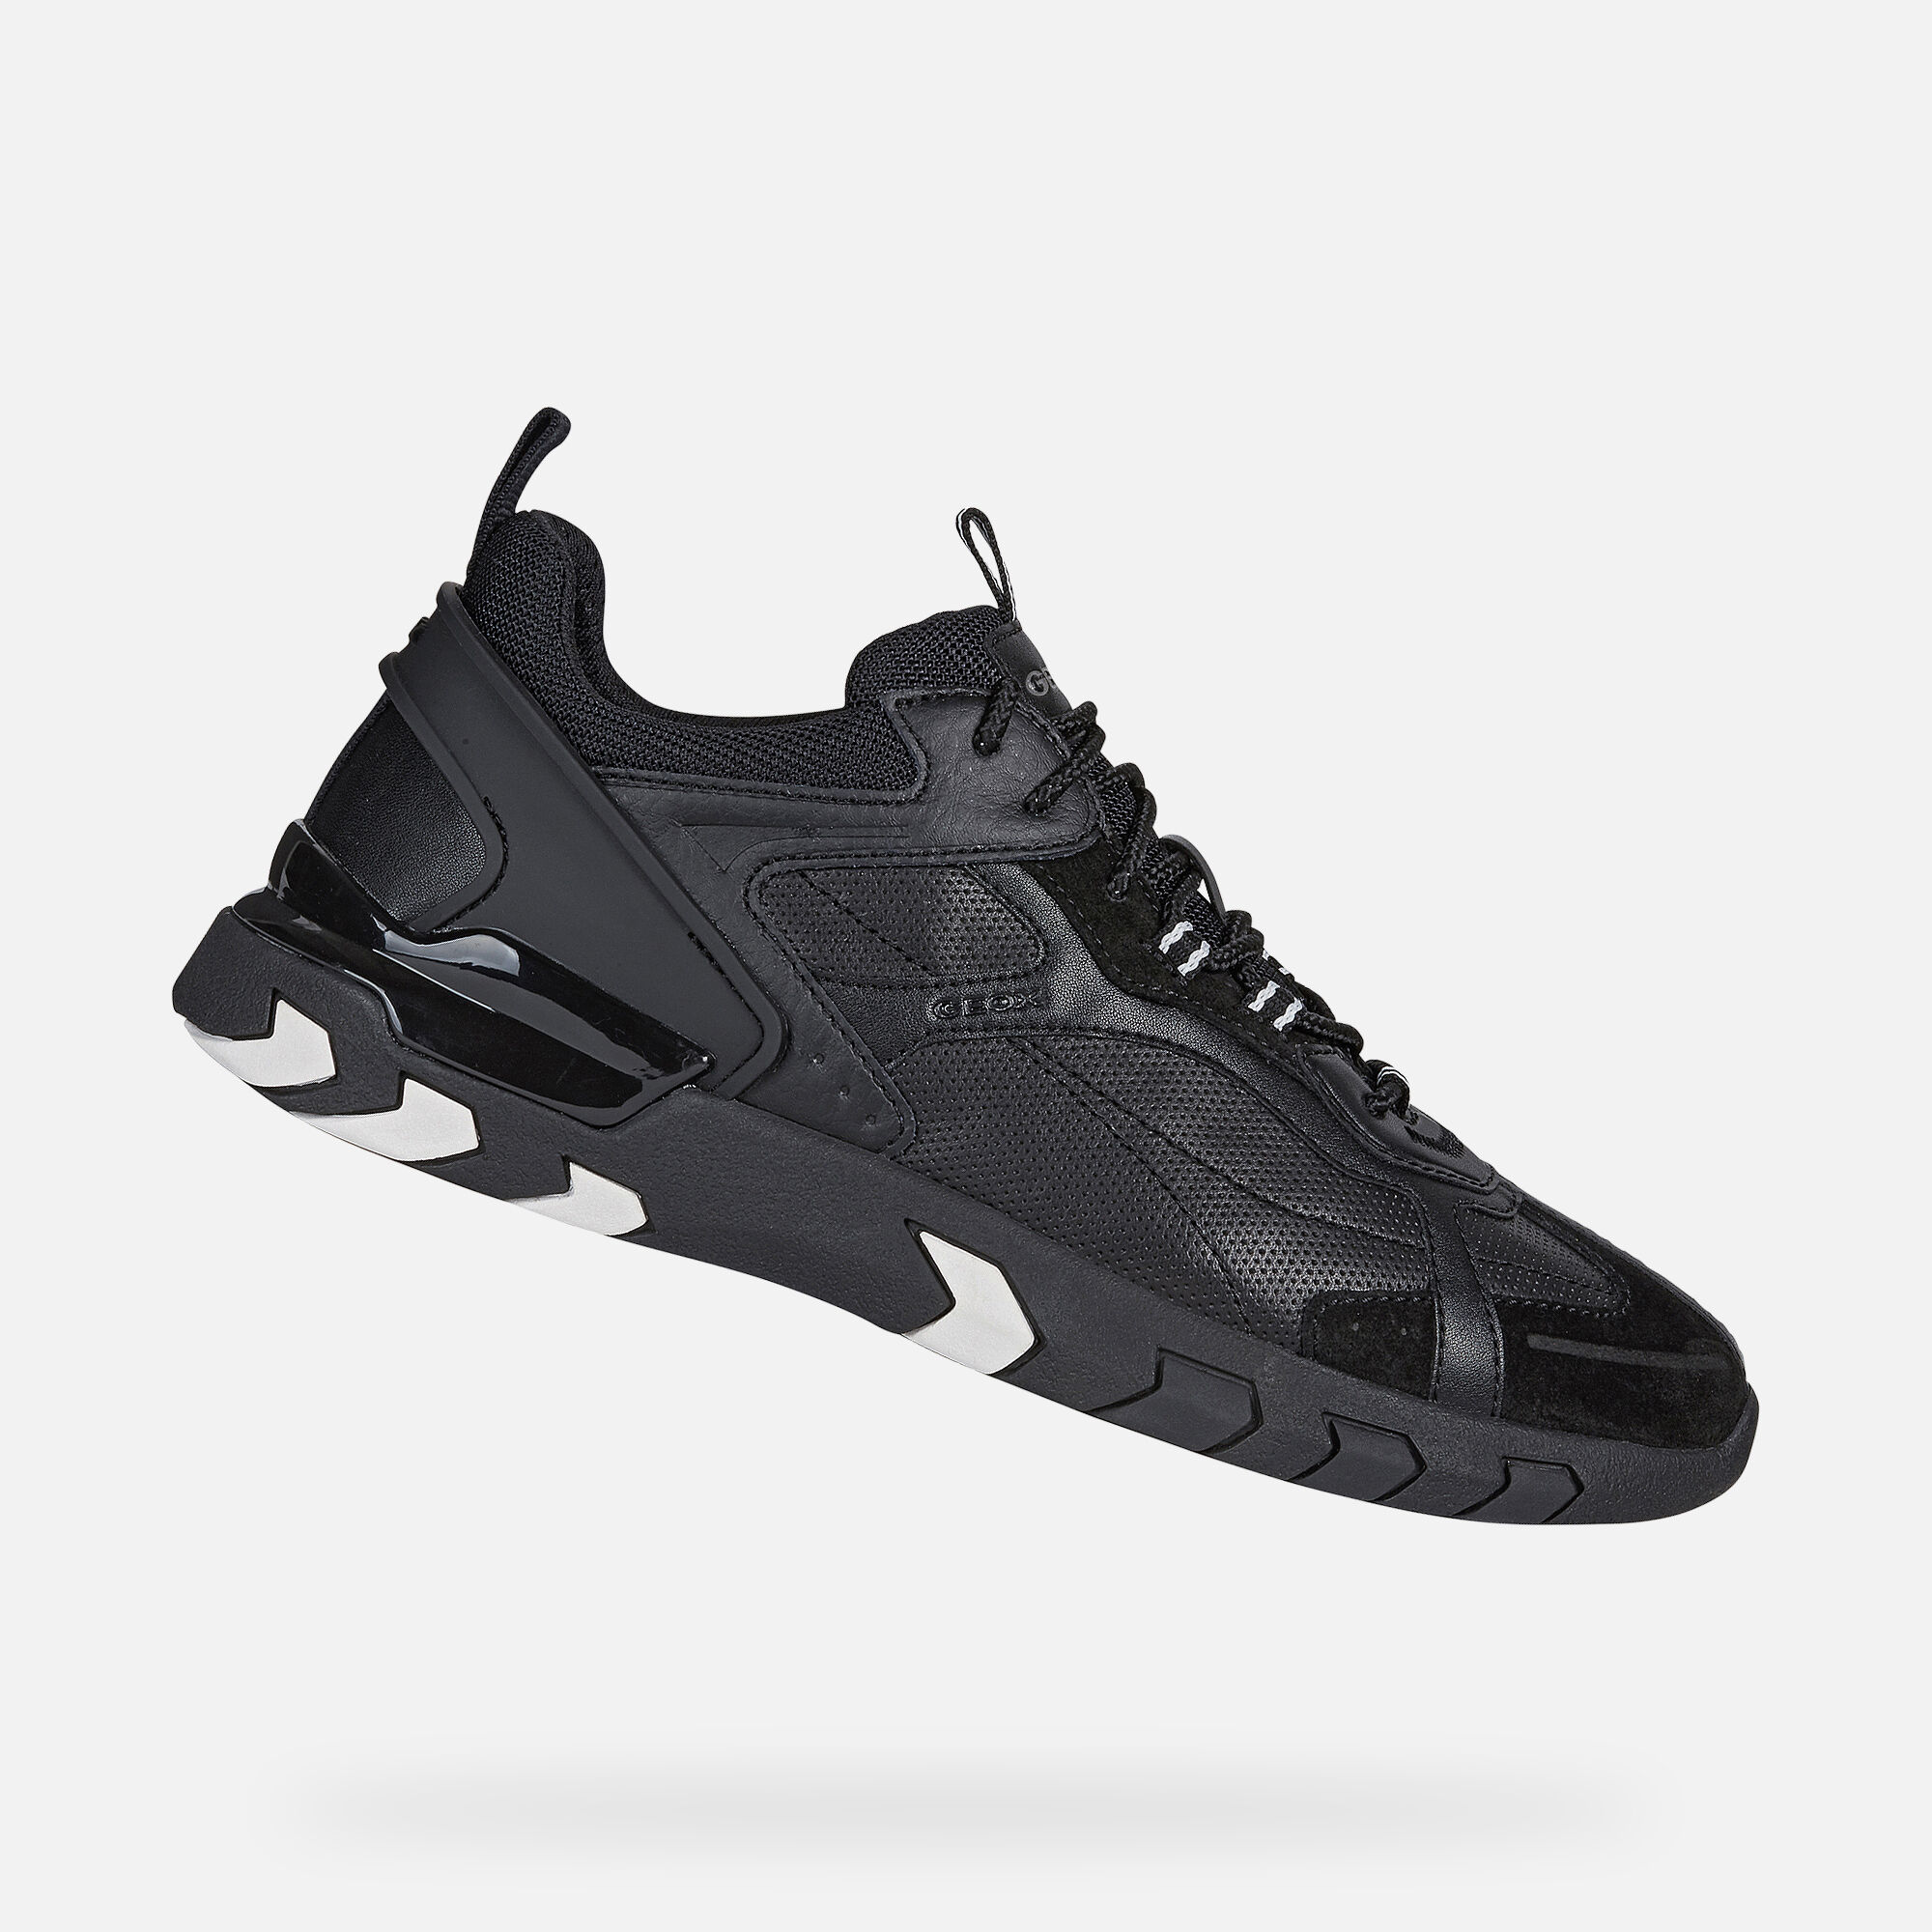 Functional Geox Women's Black Sneakers & Athletic Shoes